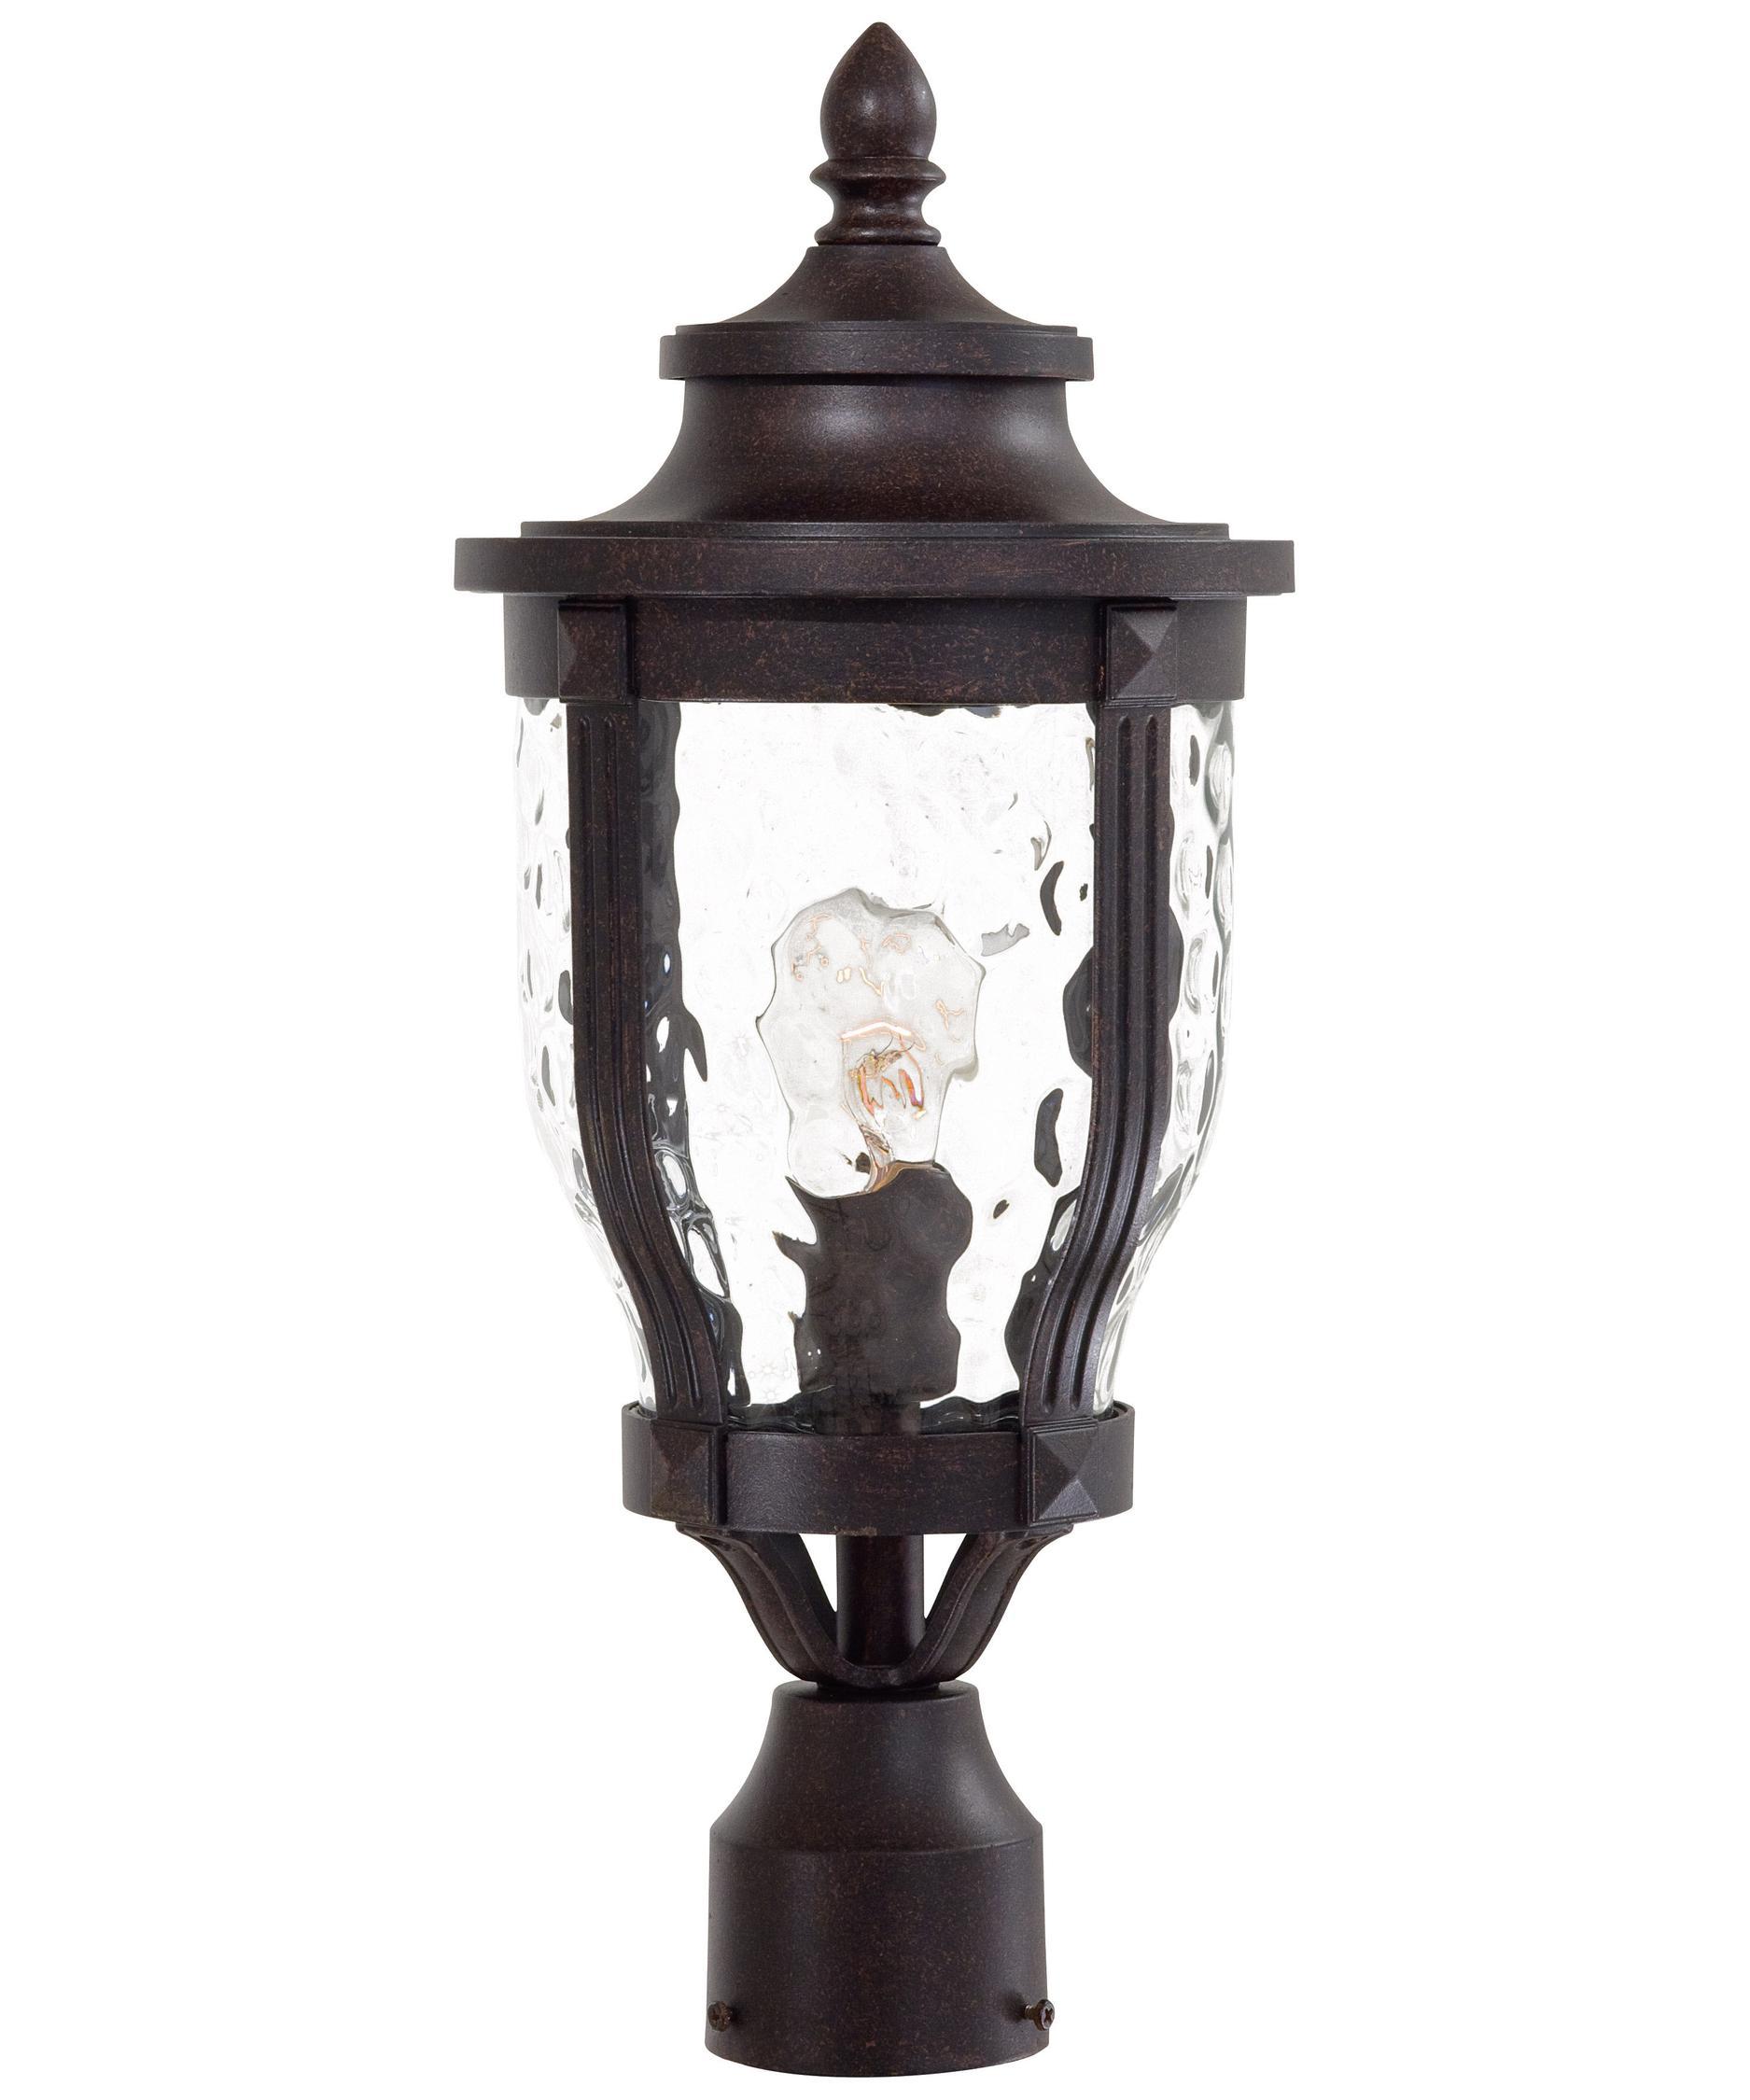 Minka Lavery 8766 Merrimack 8 Inch Wide 1 Light Outdoor Post Lamp | Capitol  Lighting 1 800lighting.com